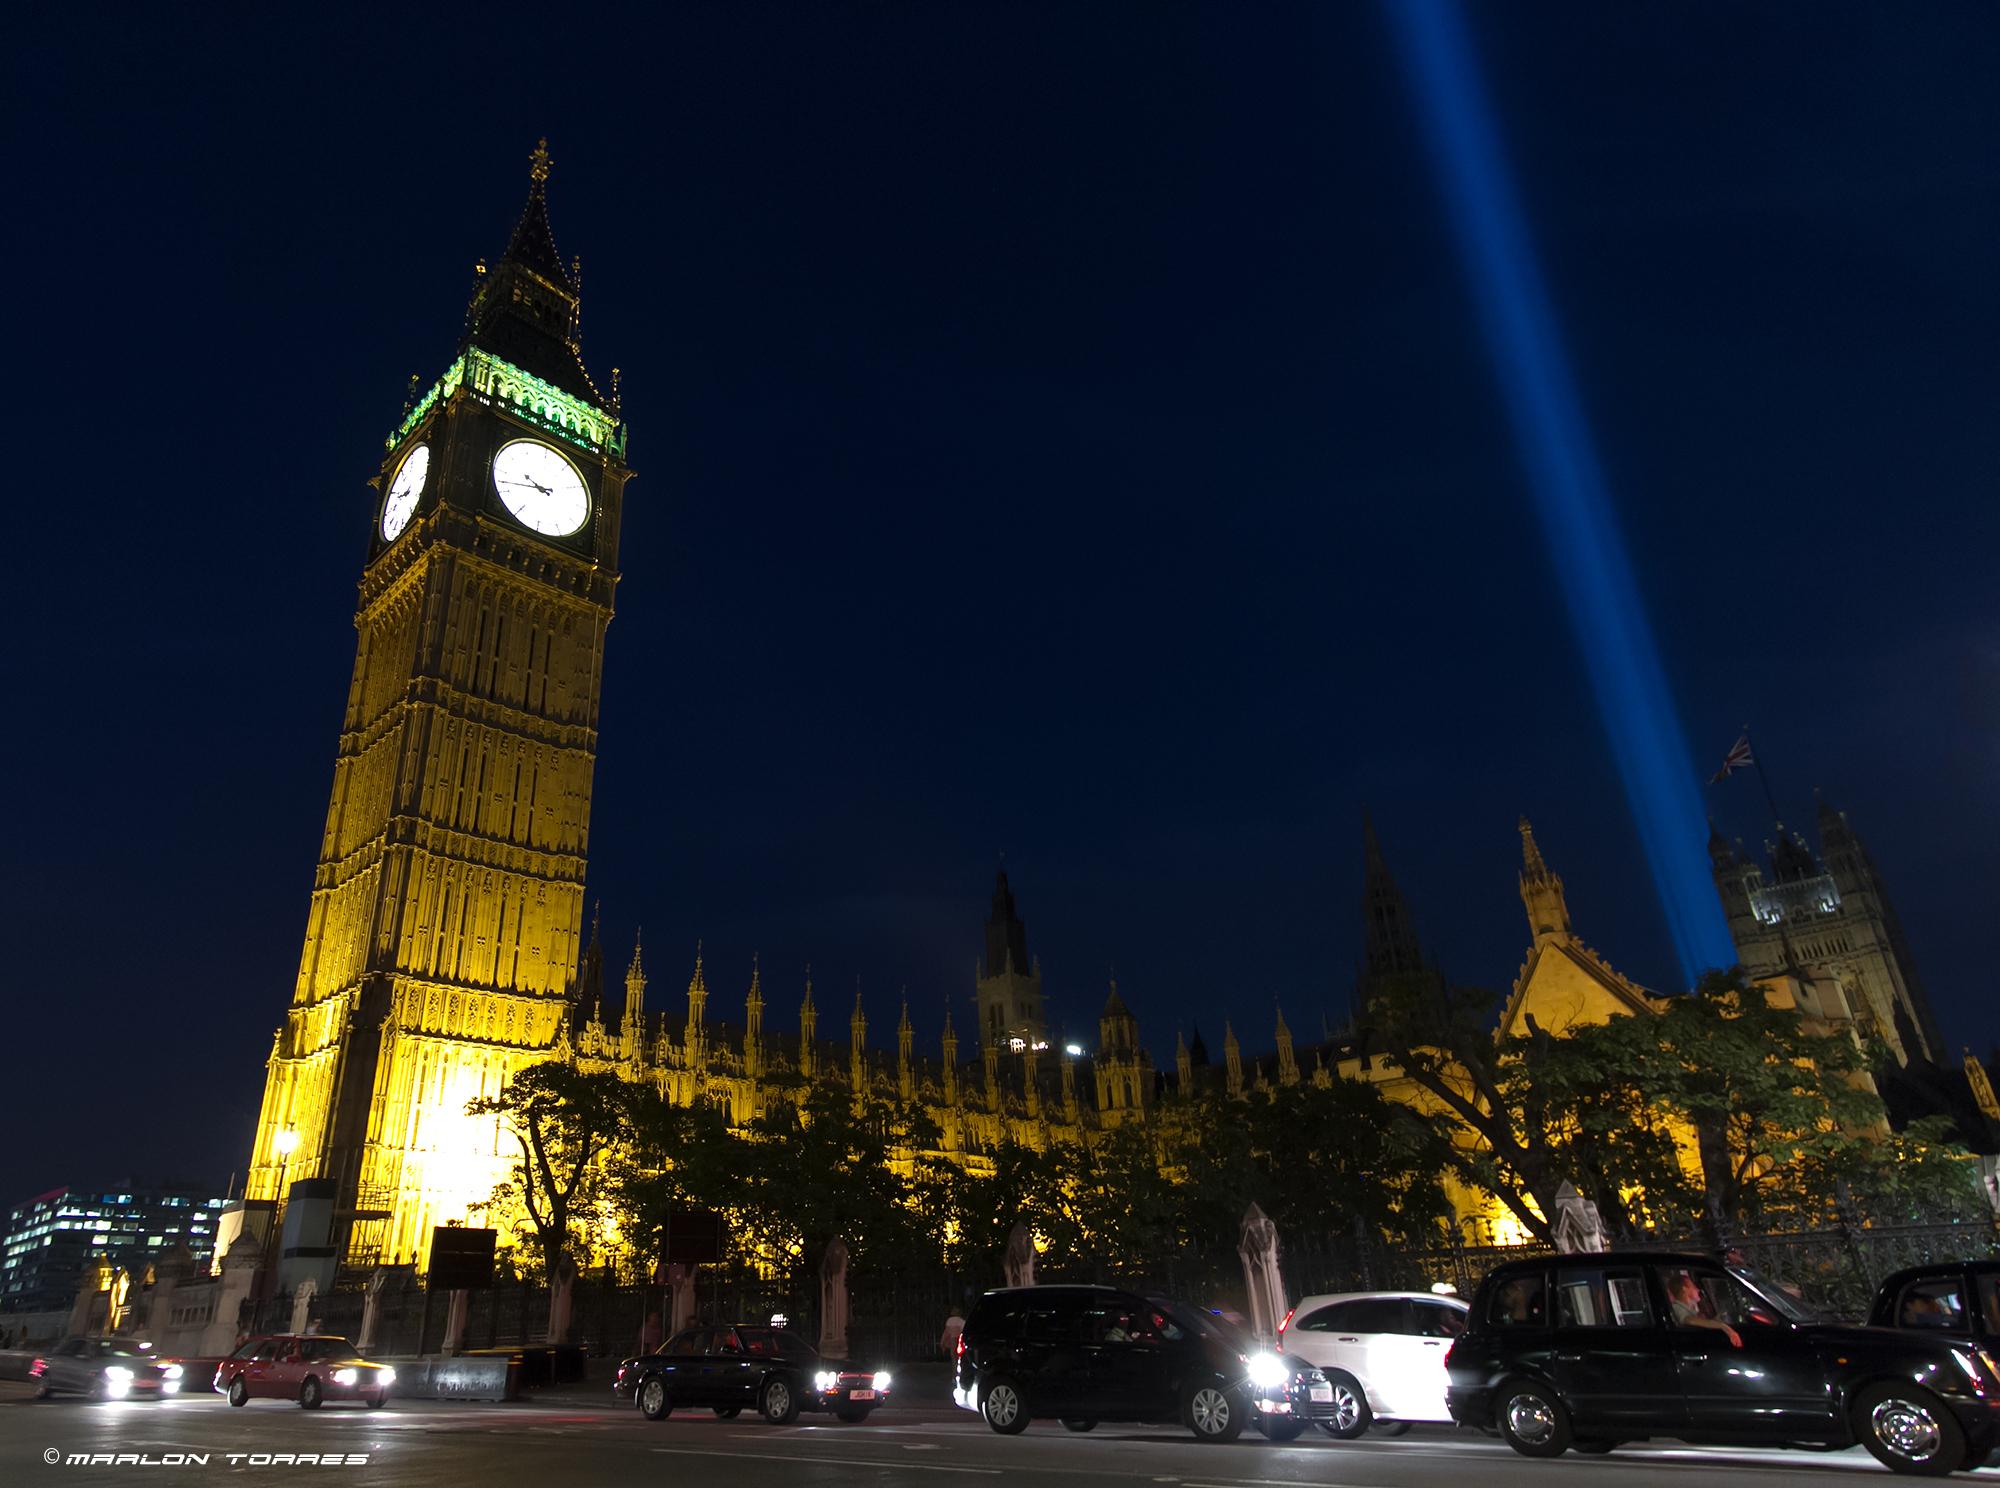 Big Ben at night. Photo: Marlon Torres